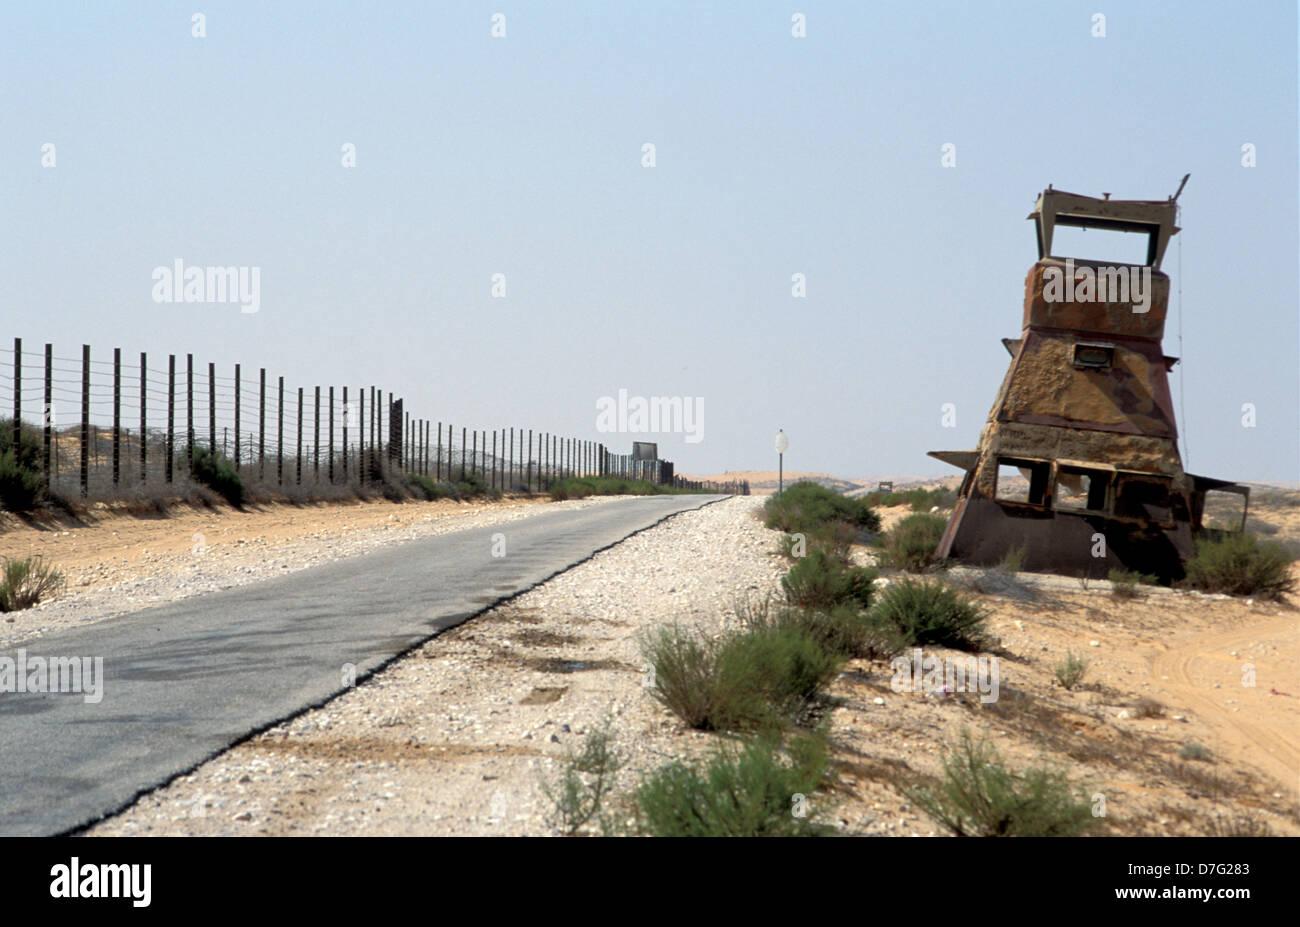 road number 10 along the border with egypt near kadesh barnea - Stock Image